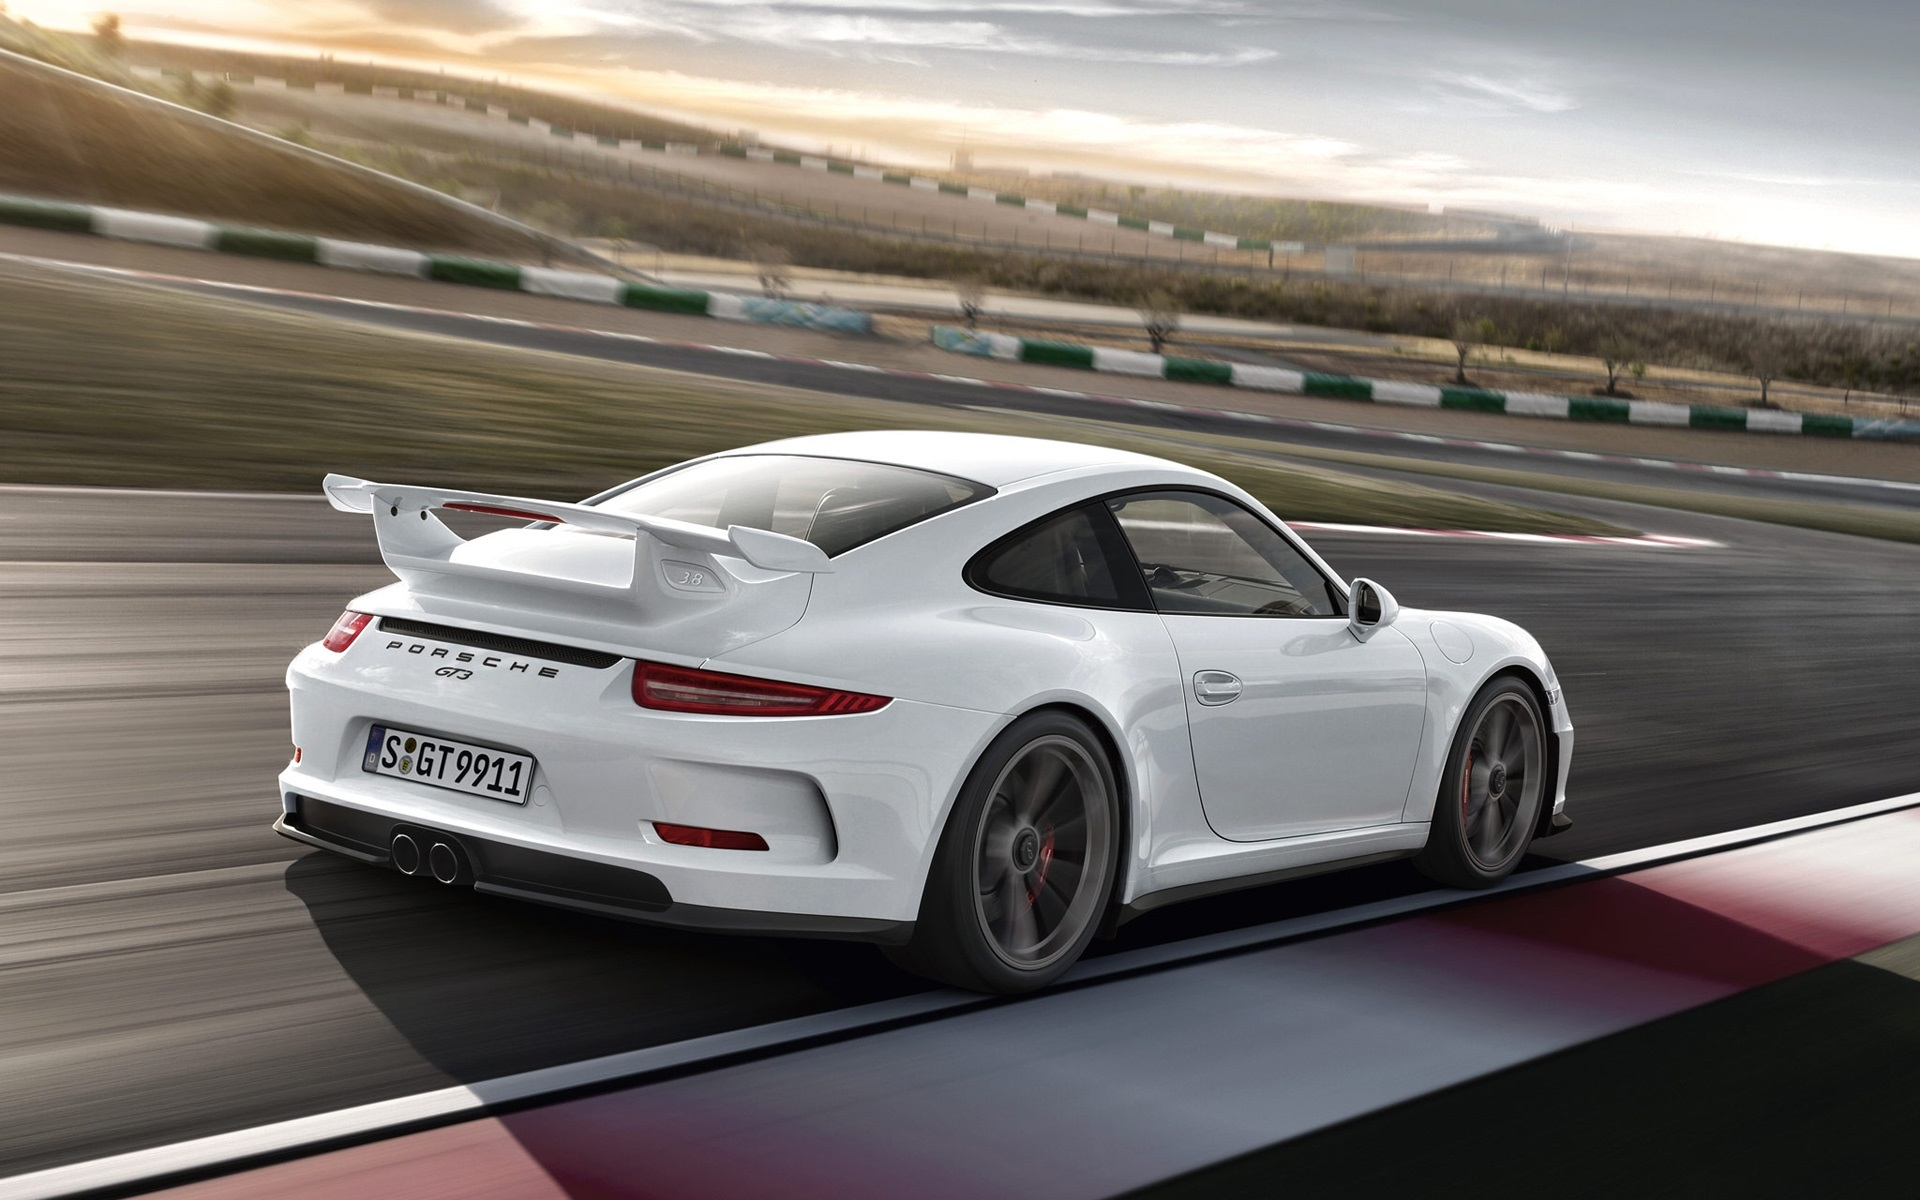 porsche 911 gt3 white car in the track wallpaper. Black Bedroom Furniture Sets. Home Design Ideas